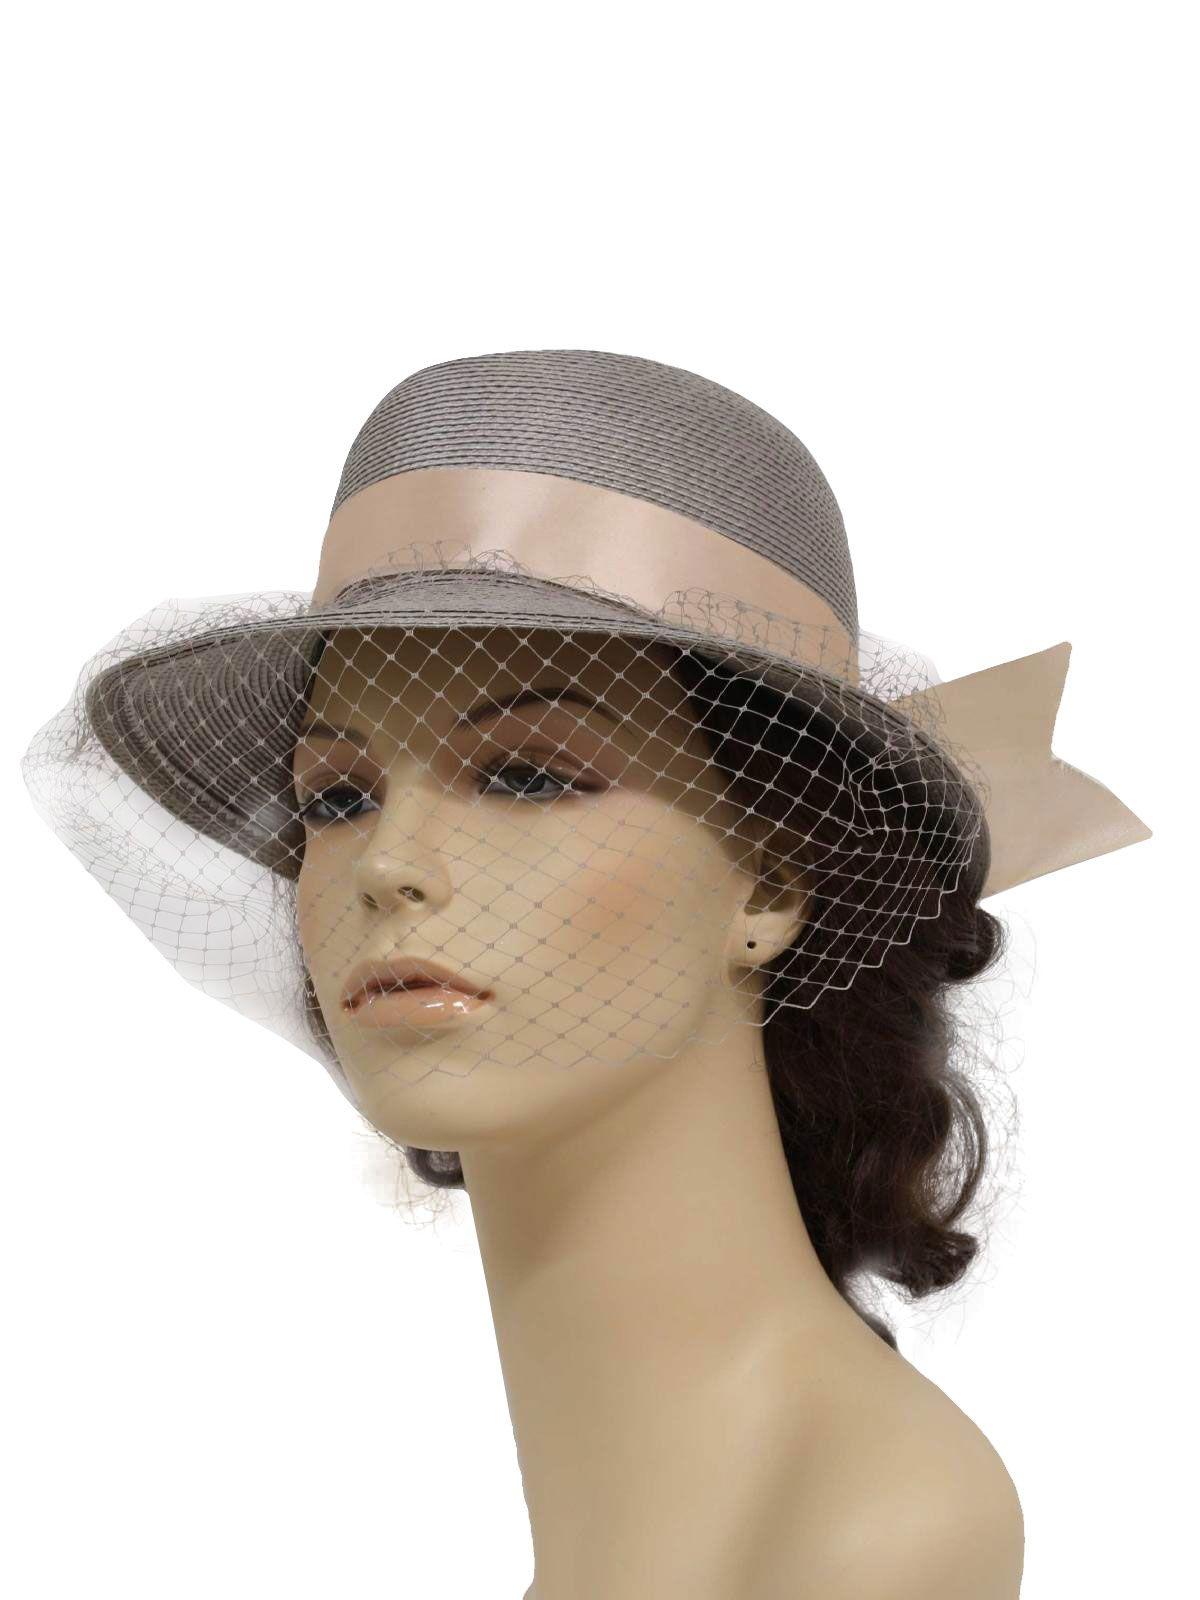 cb5372da04956 1970's Junior Seasons Womens Hat in 2019 | Hats | 70s hats, Hats ...